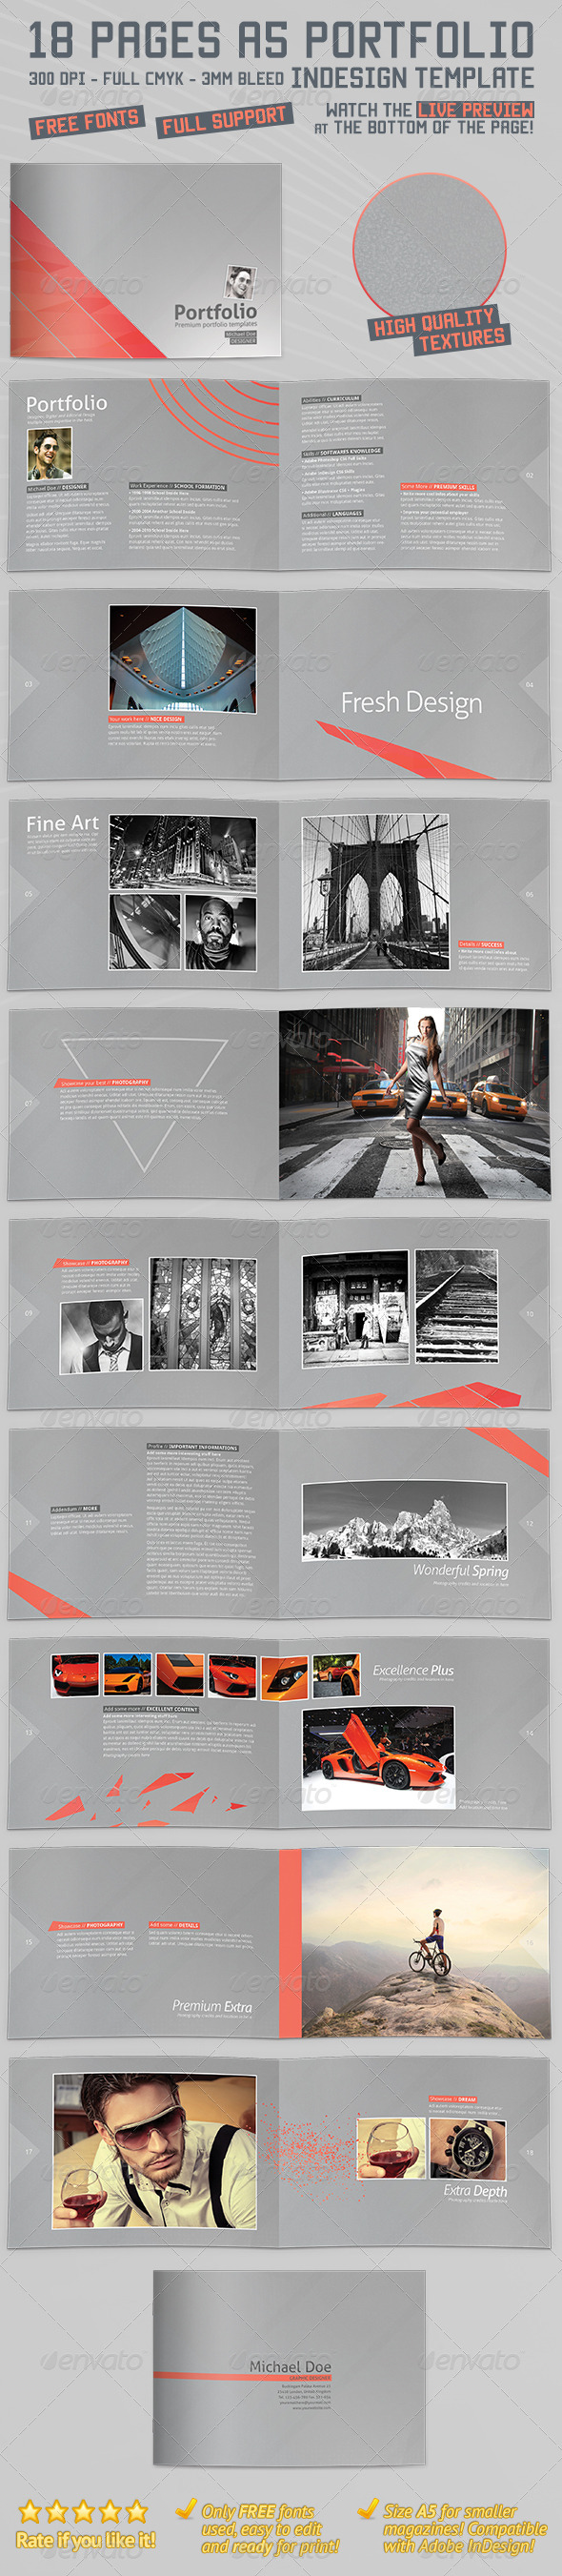 A5 Landscape Portfolio Brochure/Booklet - Portfolio Brochures